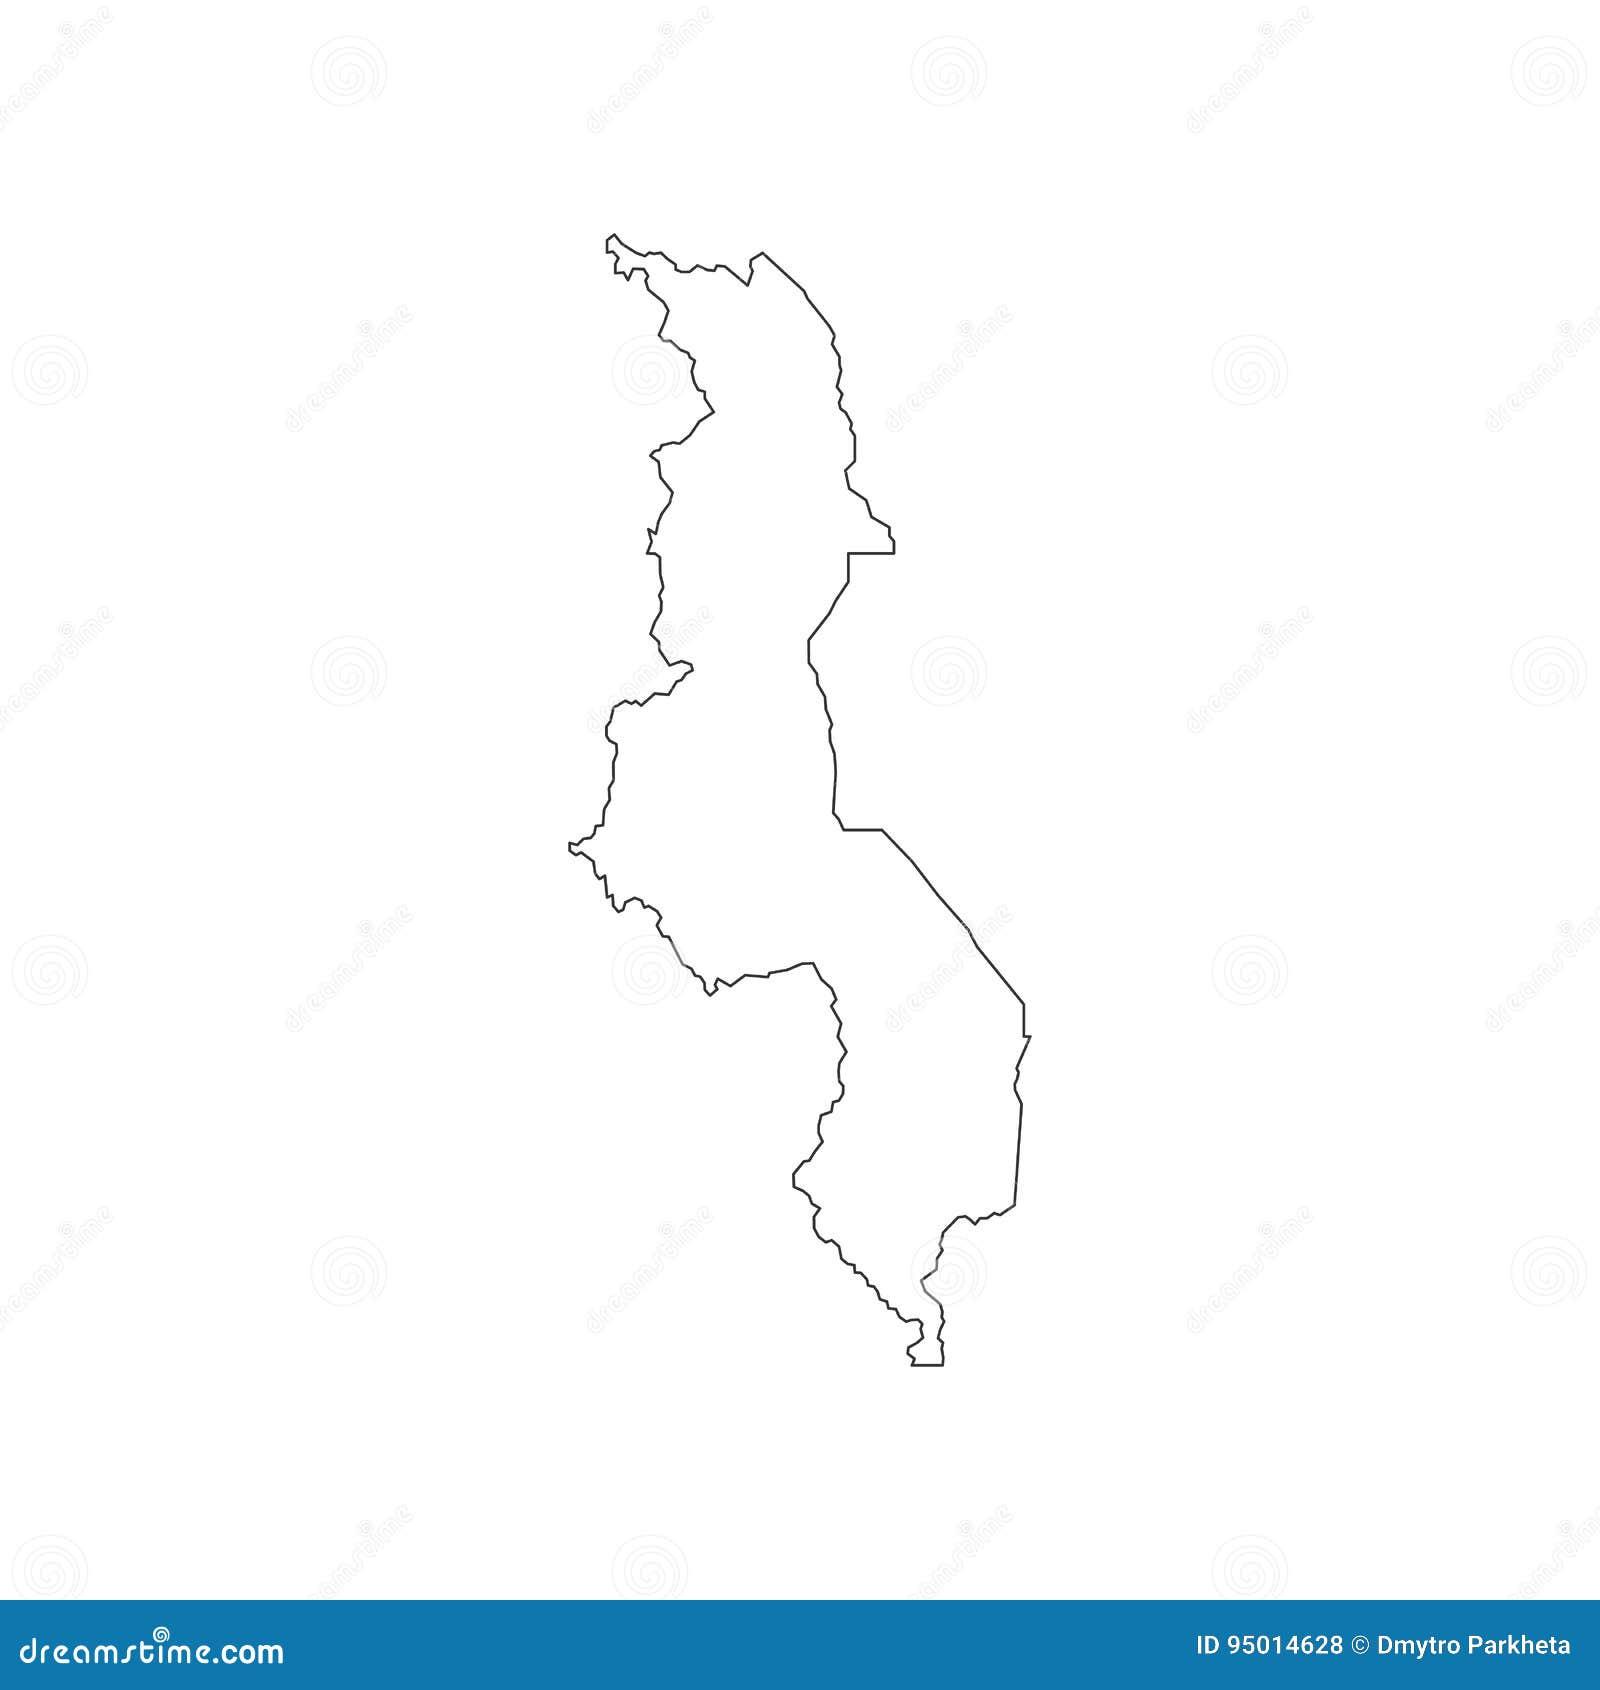 Malawi Map Outline Stock Vector Illustration Of Border - Malawi blank map